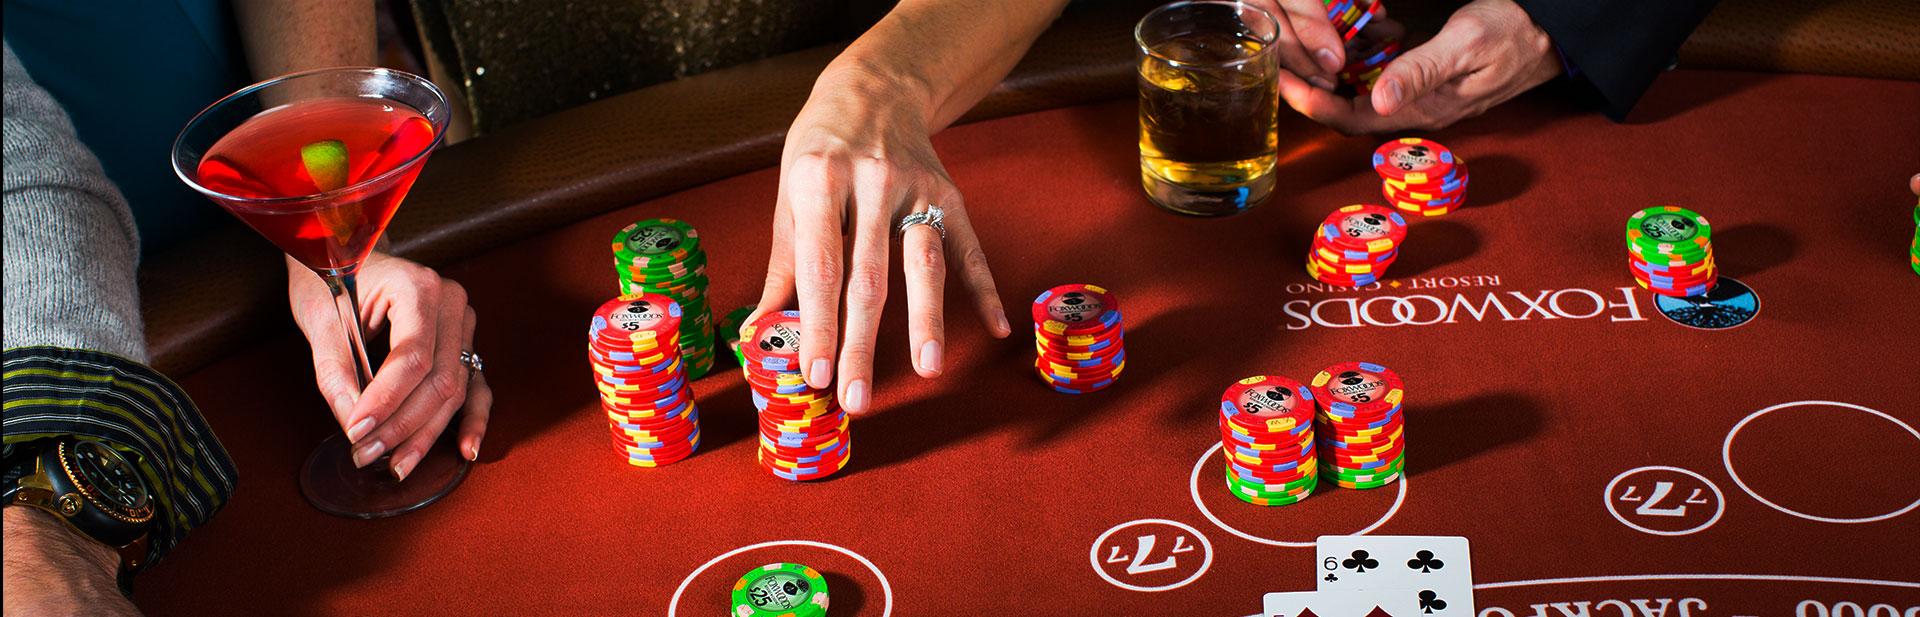 Golden Perks Benefits Hub Gaming Bg